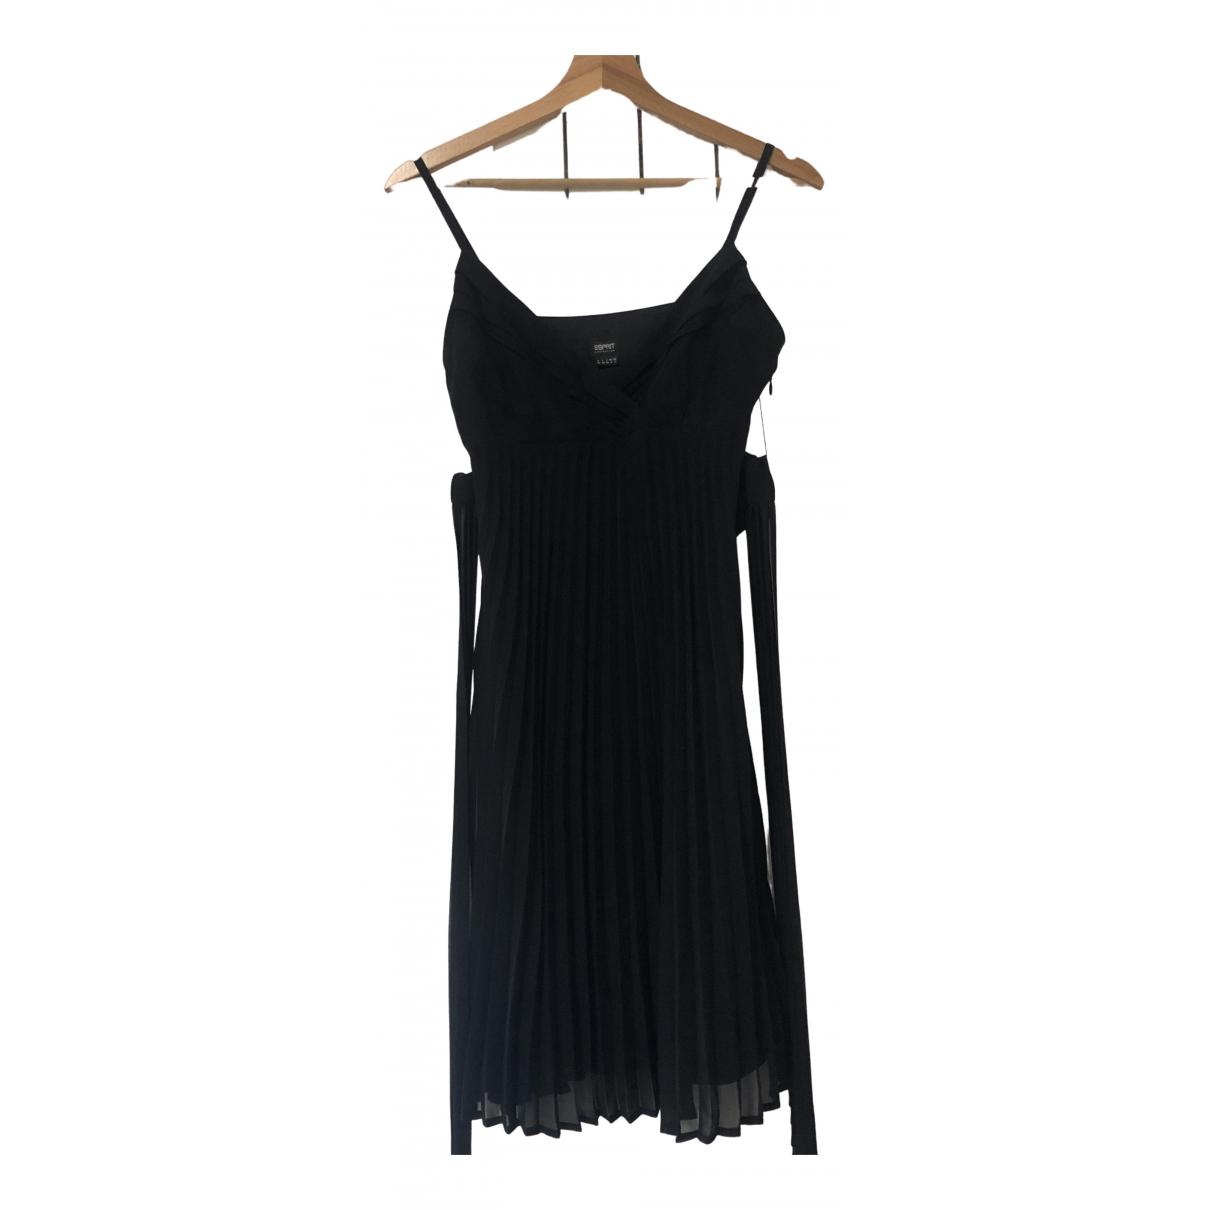 Esprit \N Kleid in  Schwarz Synthetik